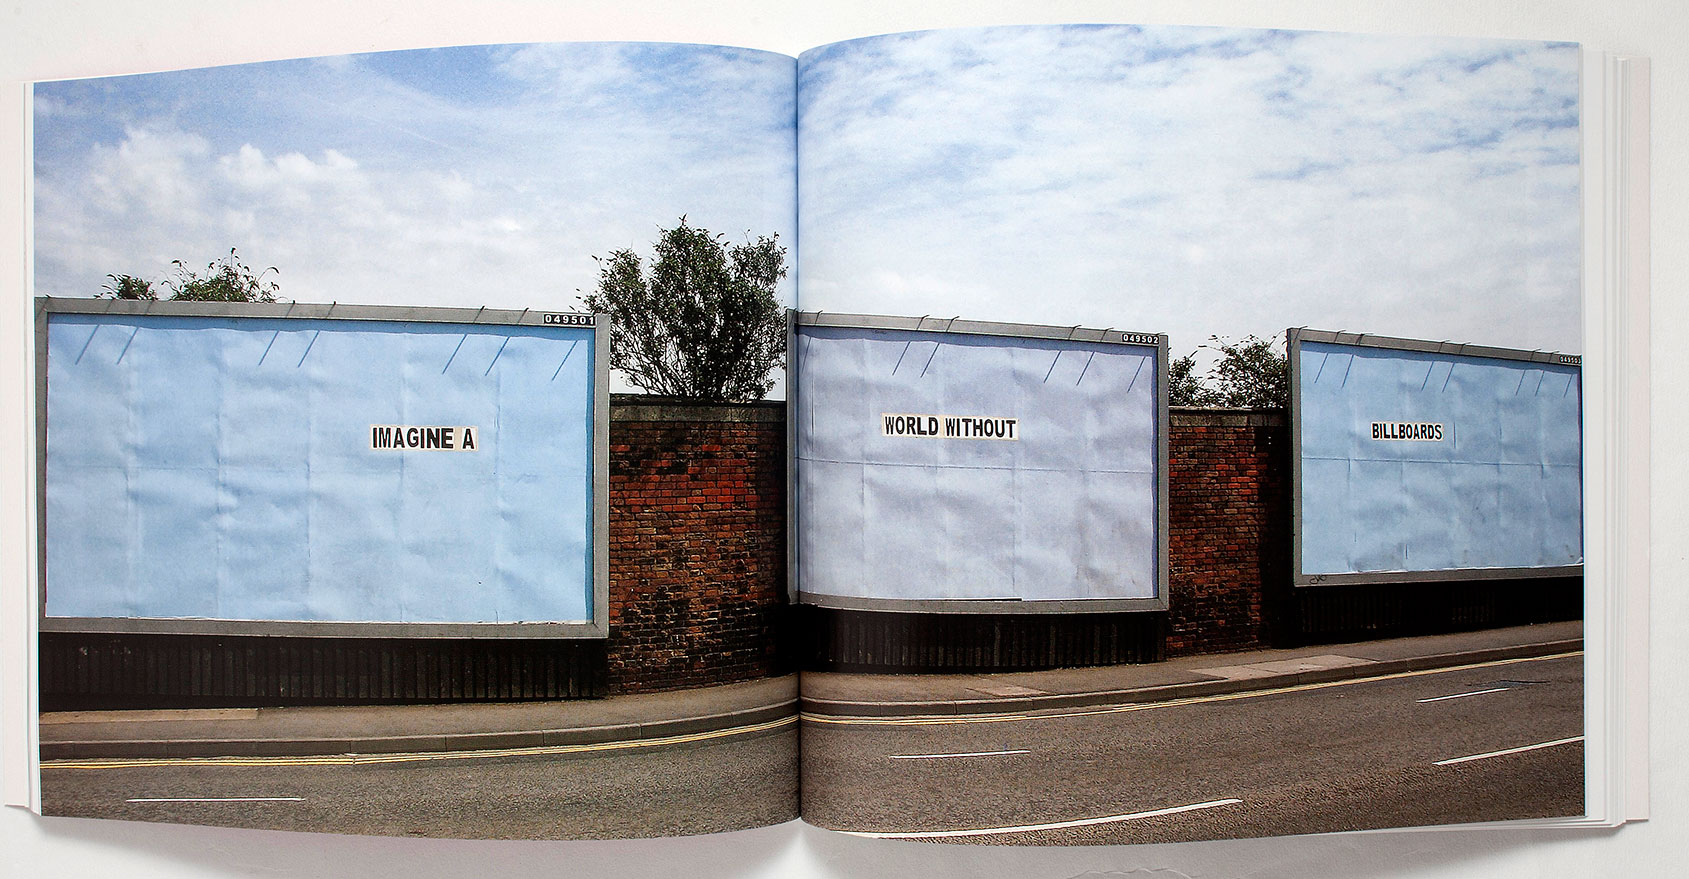 epm-print-management-political-books-don-pedro-4.jpg